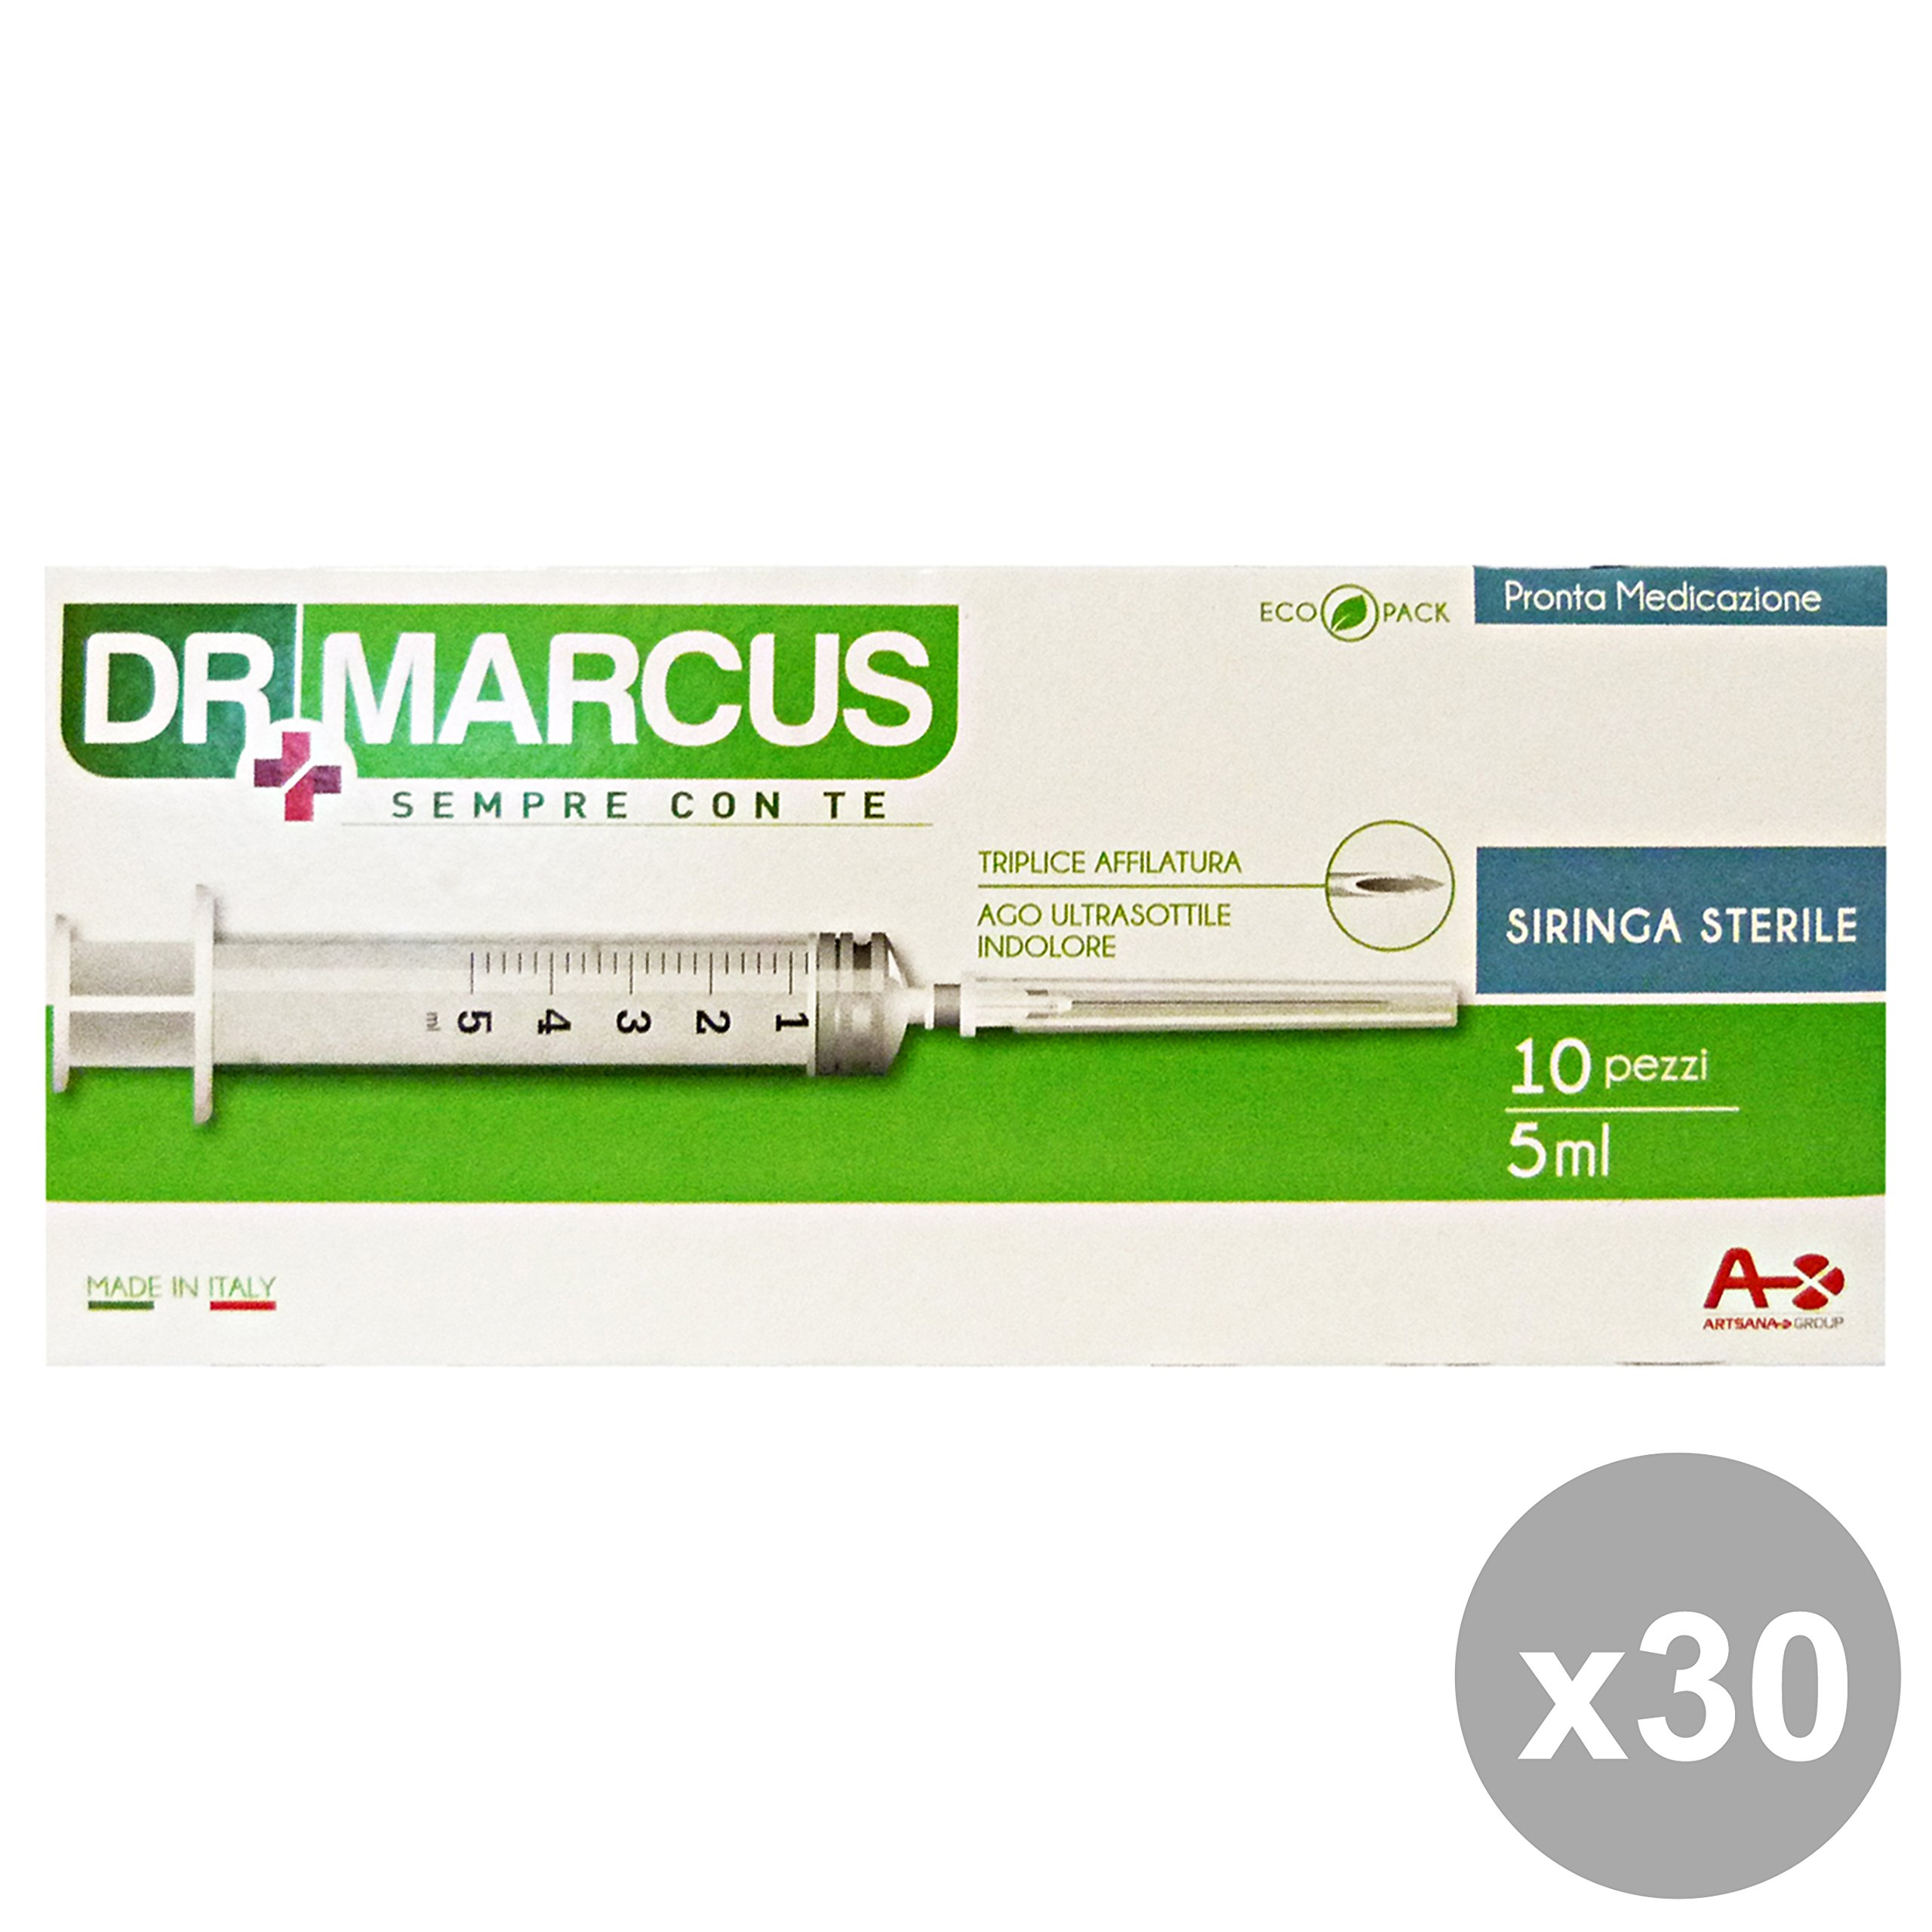 Set 30 DR.MARCUS Siringhe * 10 Pezzi Disinfettanti e igienizzanti